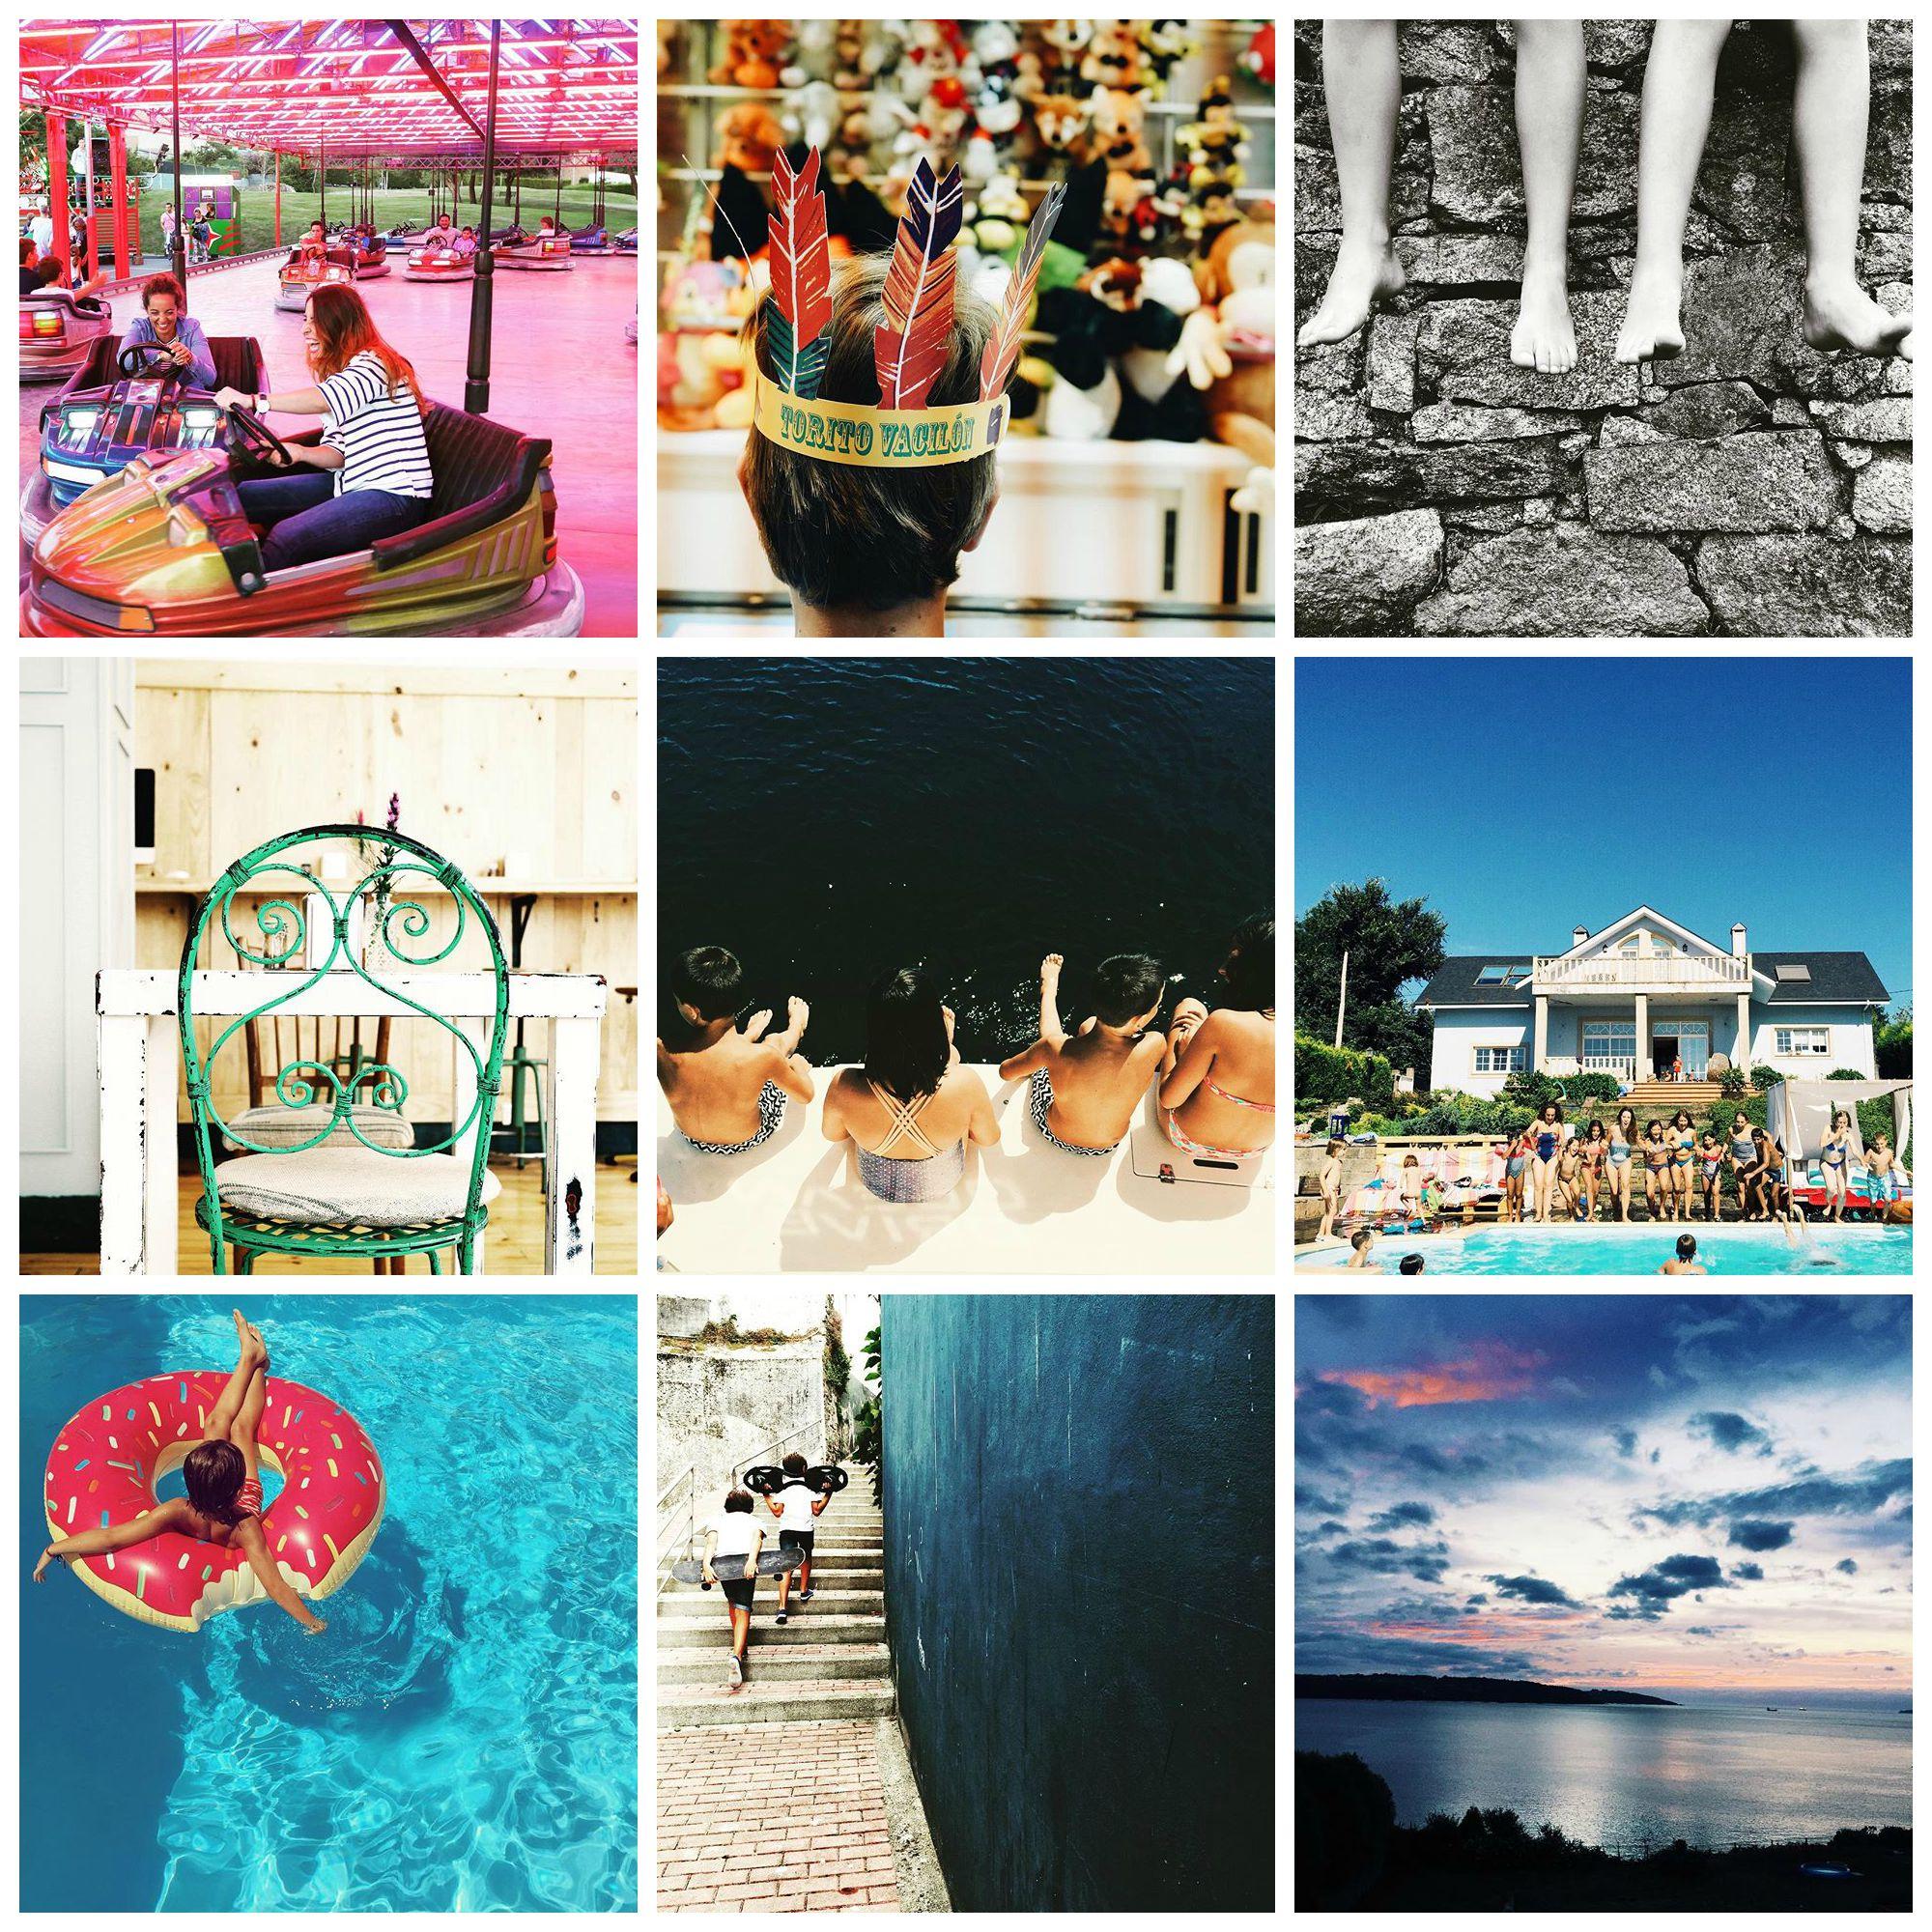 #veranovale la vuelta-7645-baballa